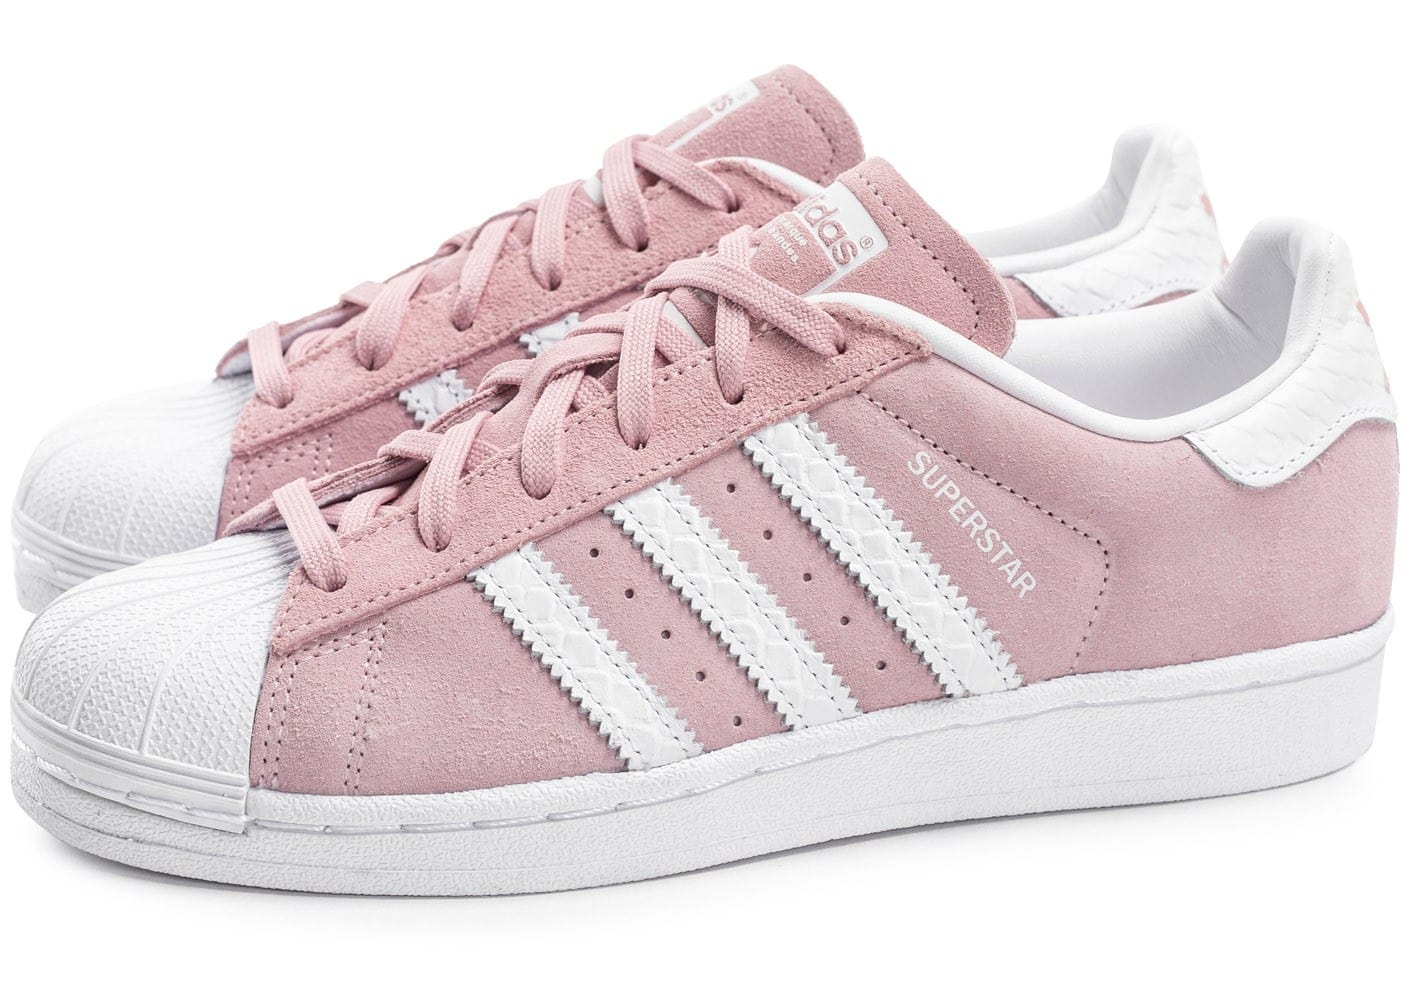 0ff846a6651 adidas chaussure femme rose